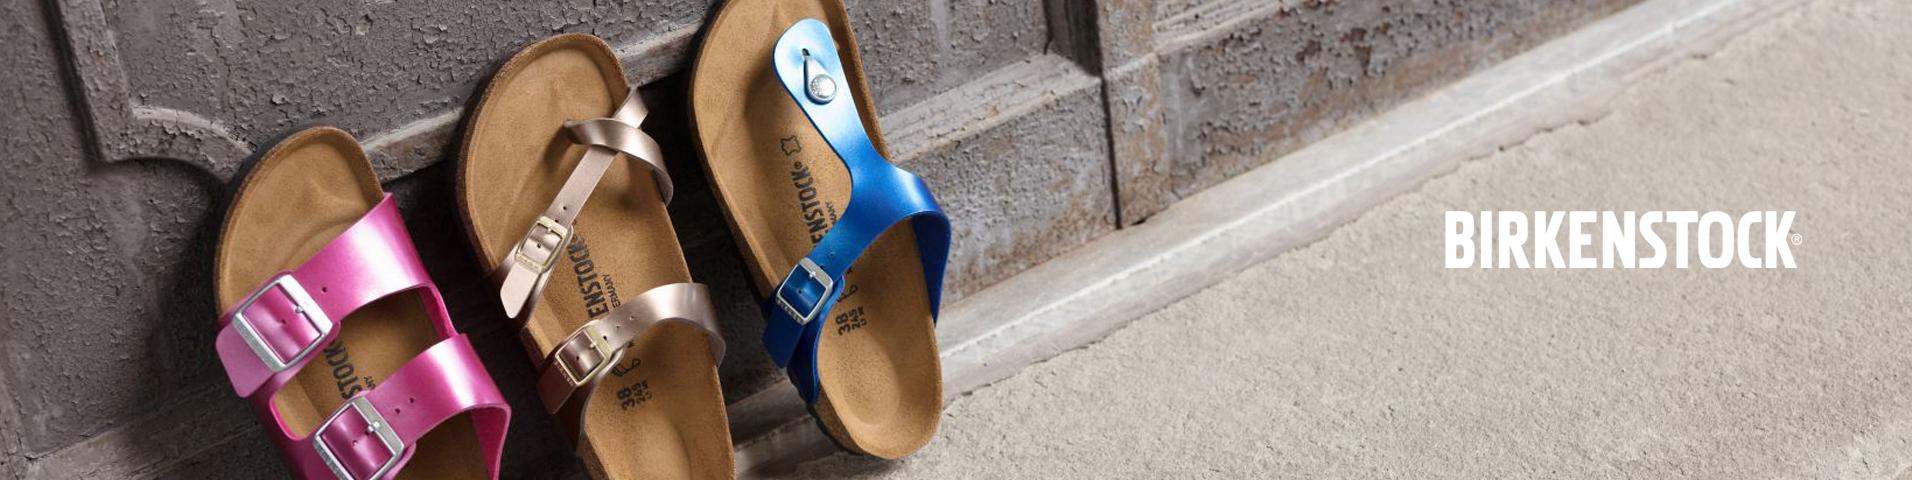 Scarpe donna Birkenstock | Grande assortimento di calzature